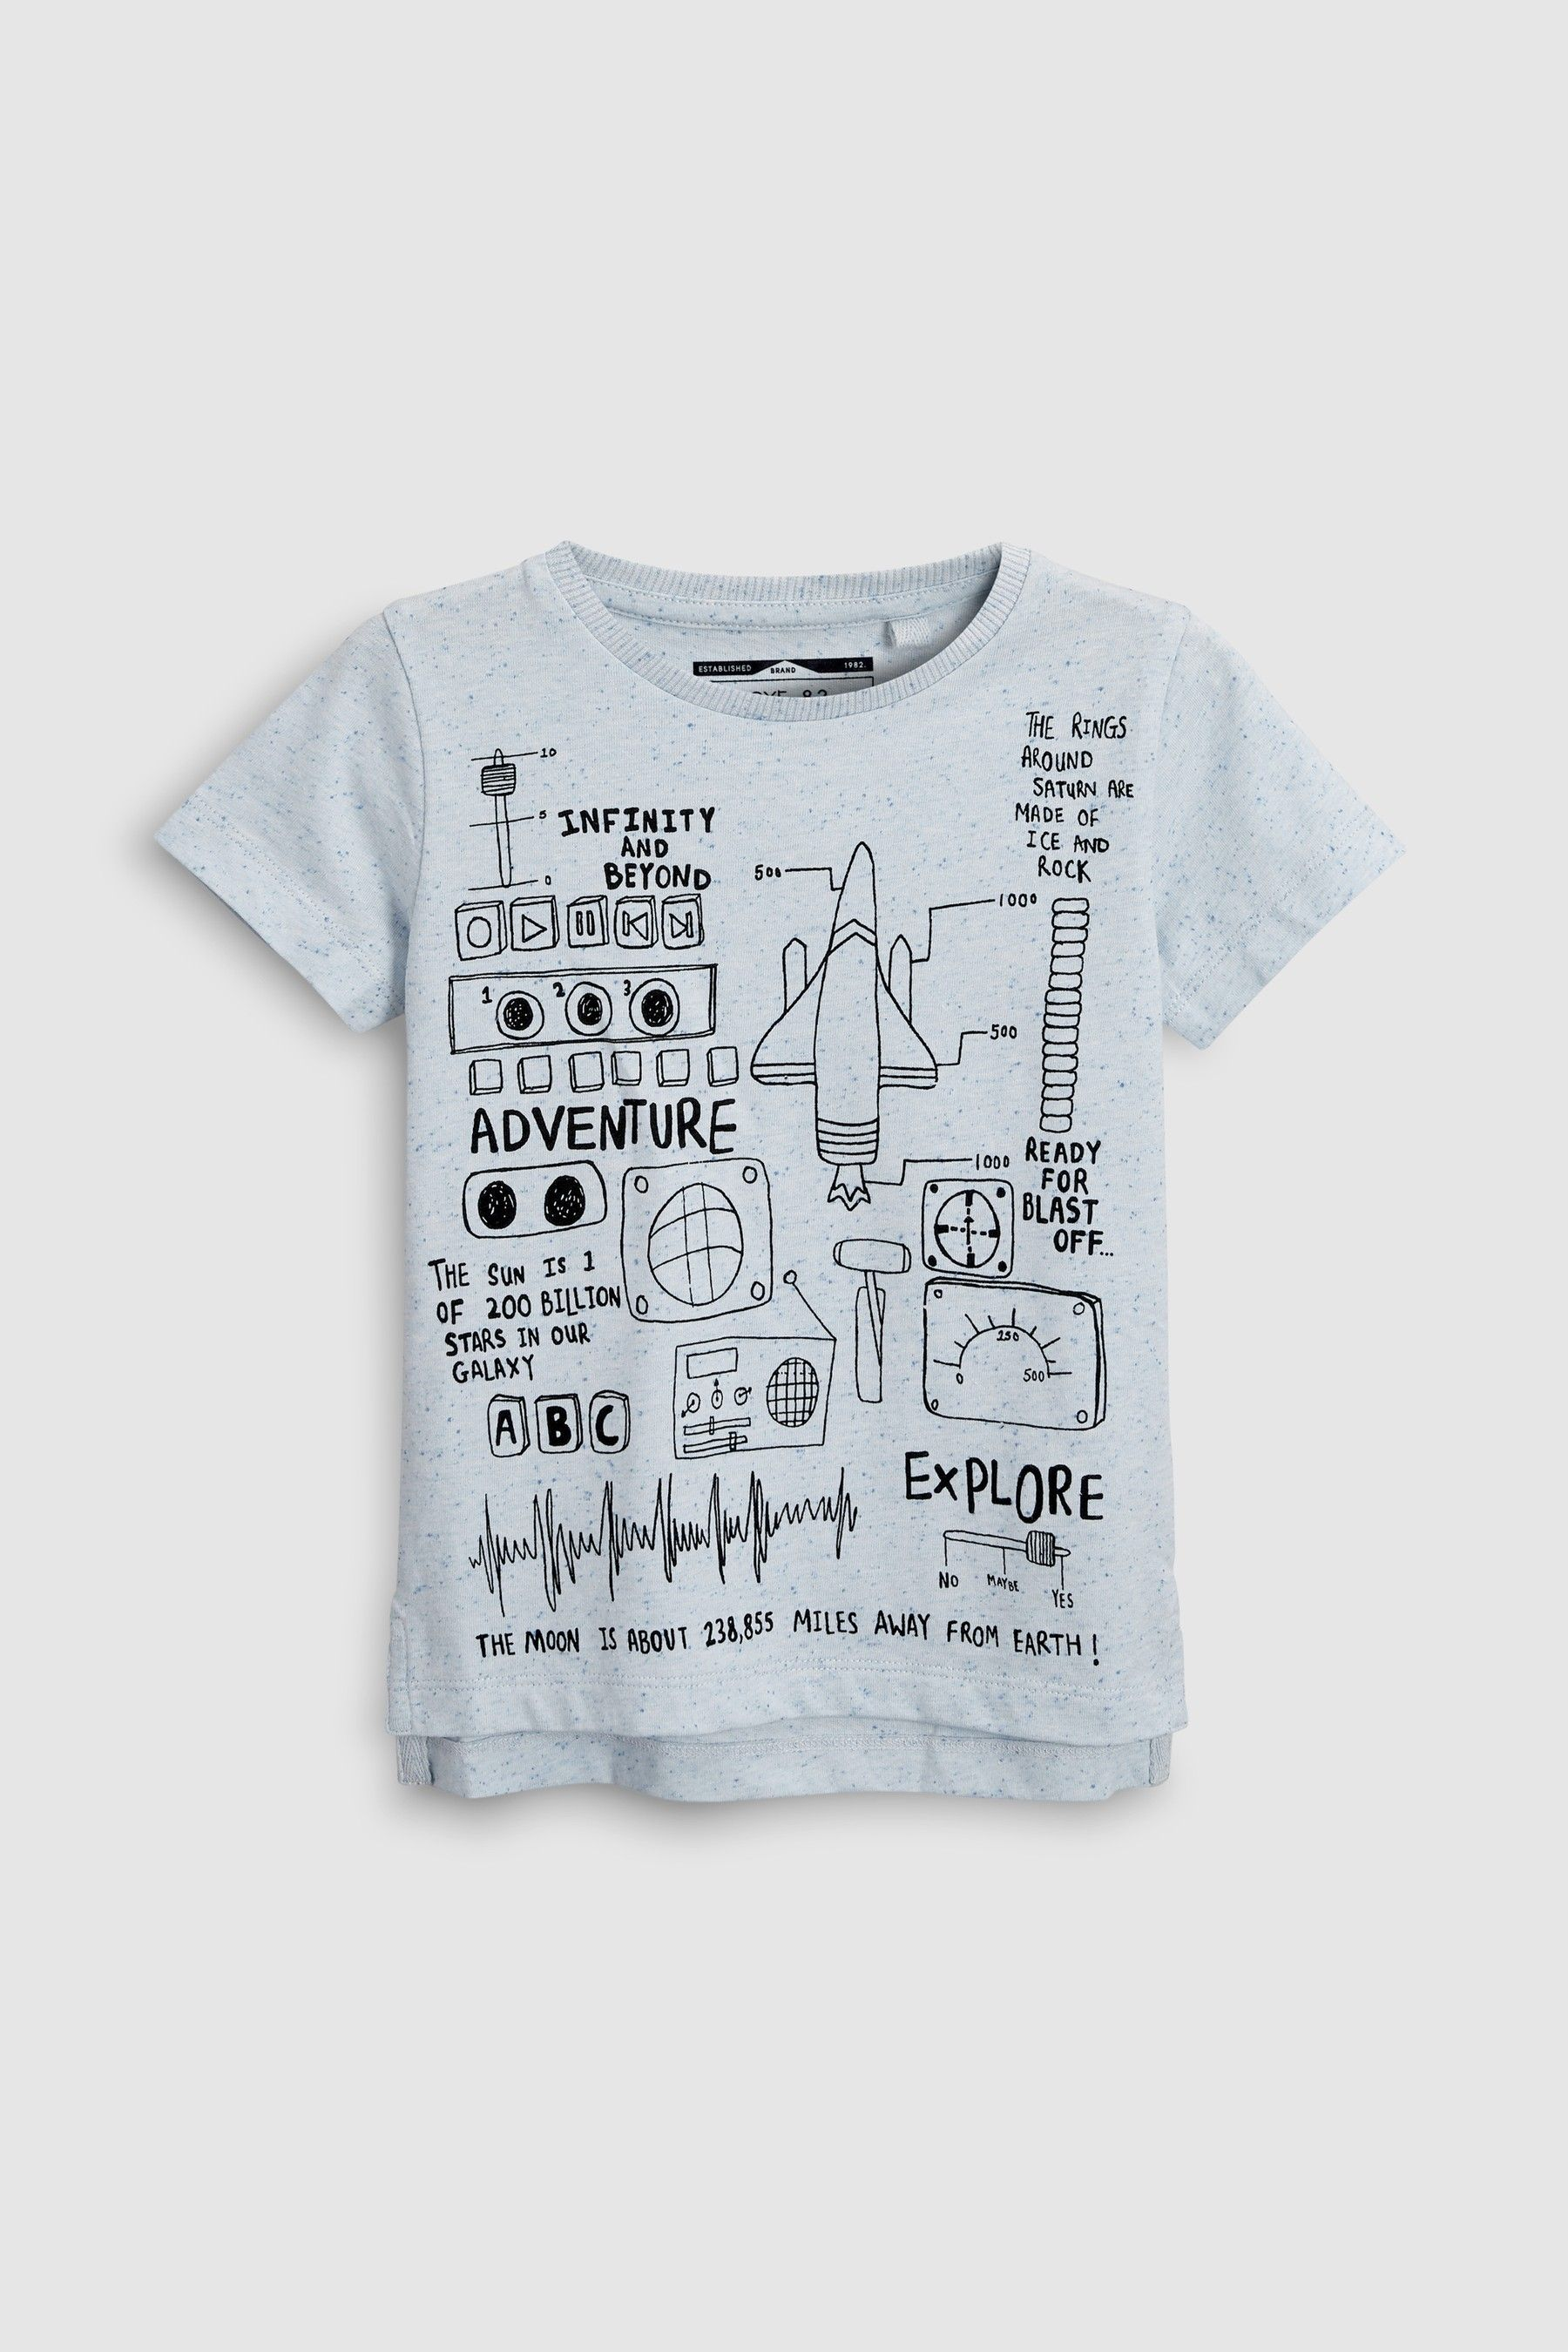 d46d7b9a Buy T Shirts Online Uk